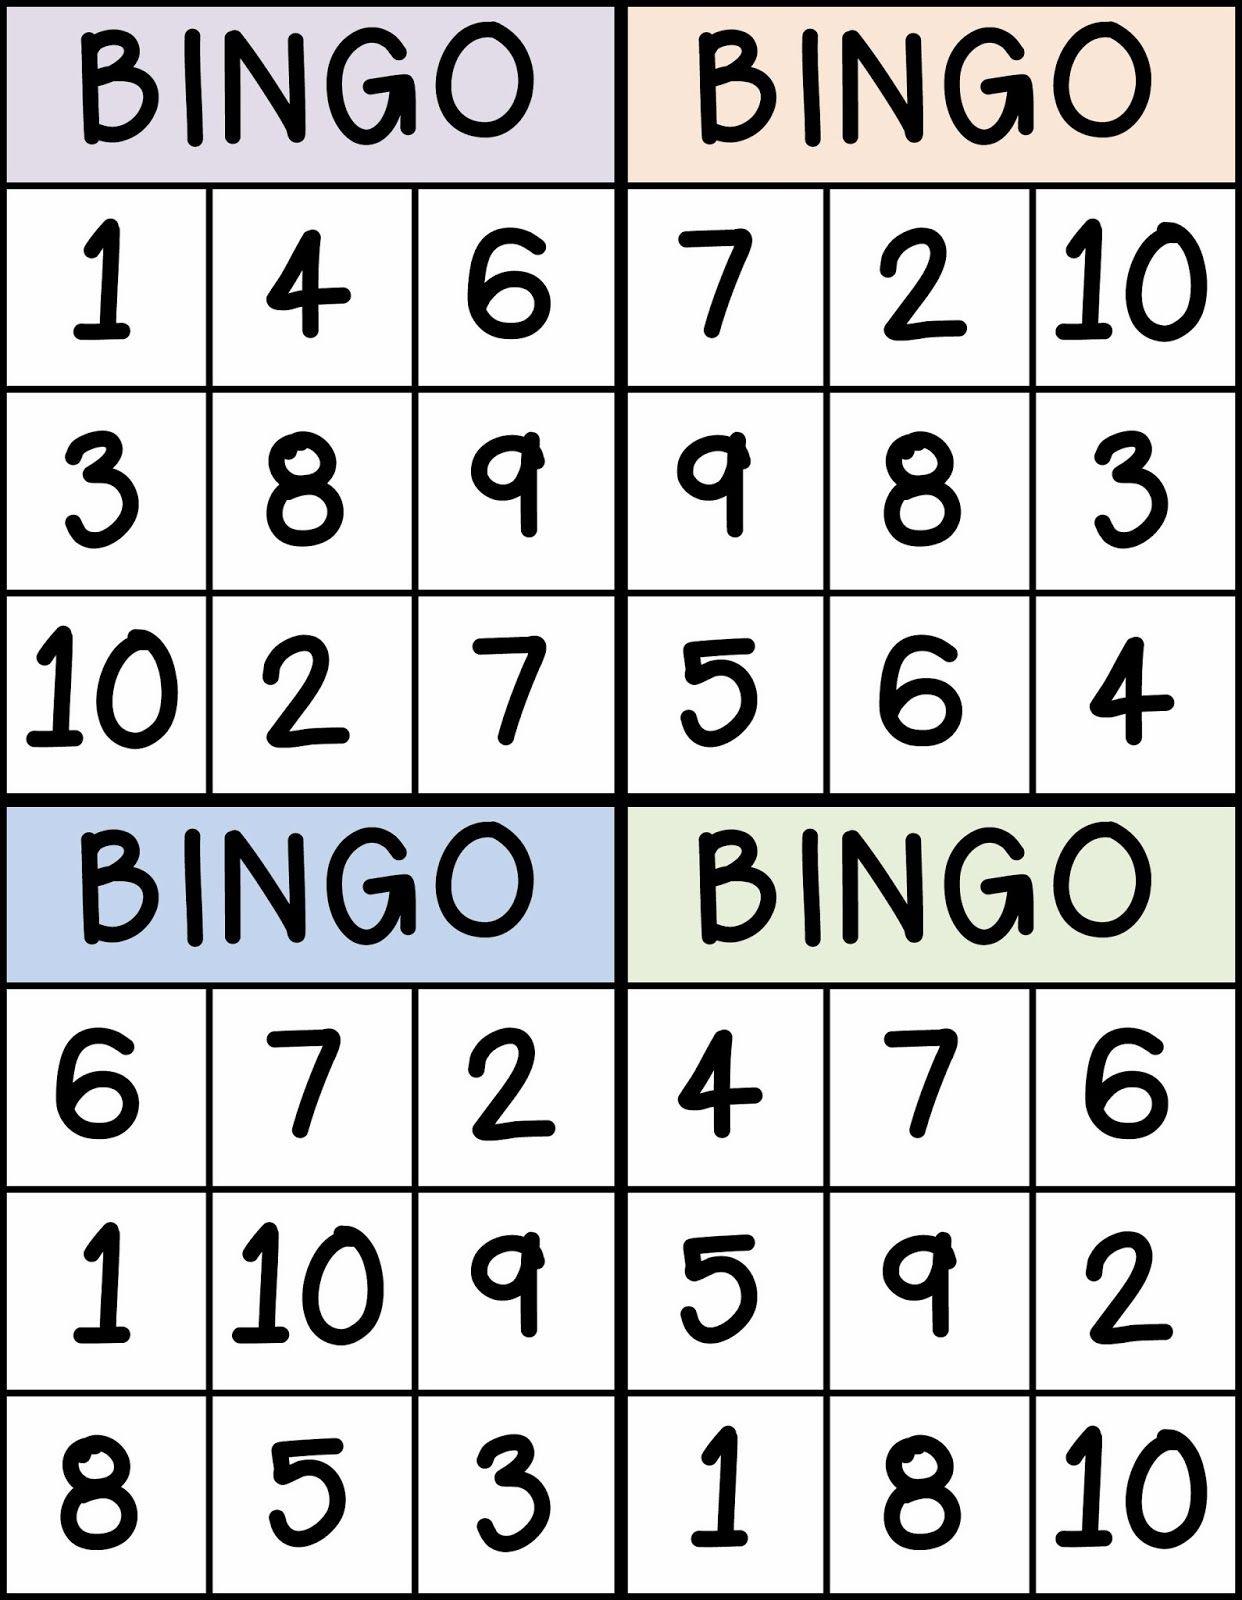 Bingo Nummers 1 Tem 10 | Cartelas De Bingo, Ensino Dos Números